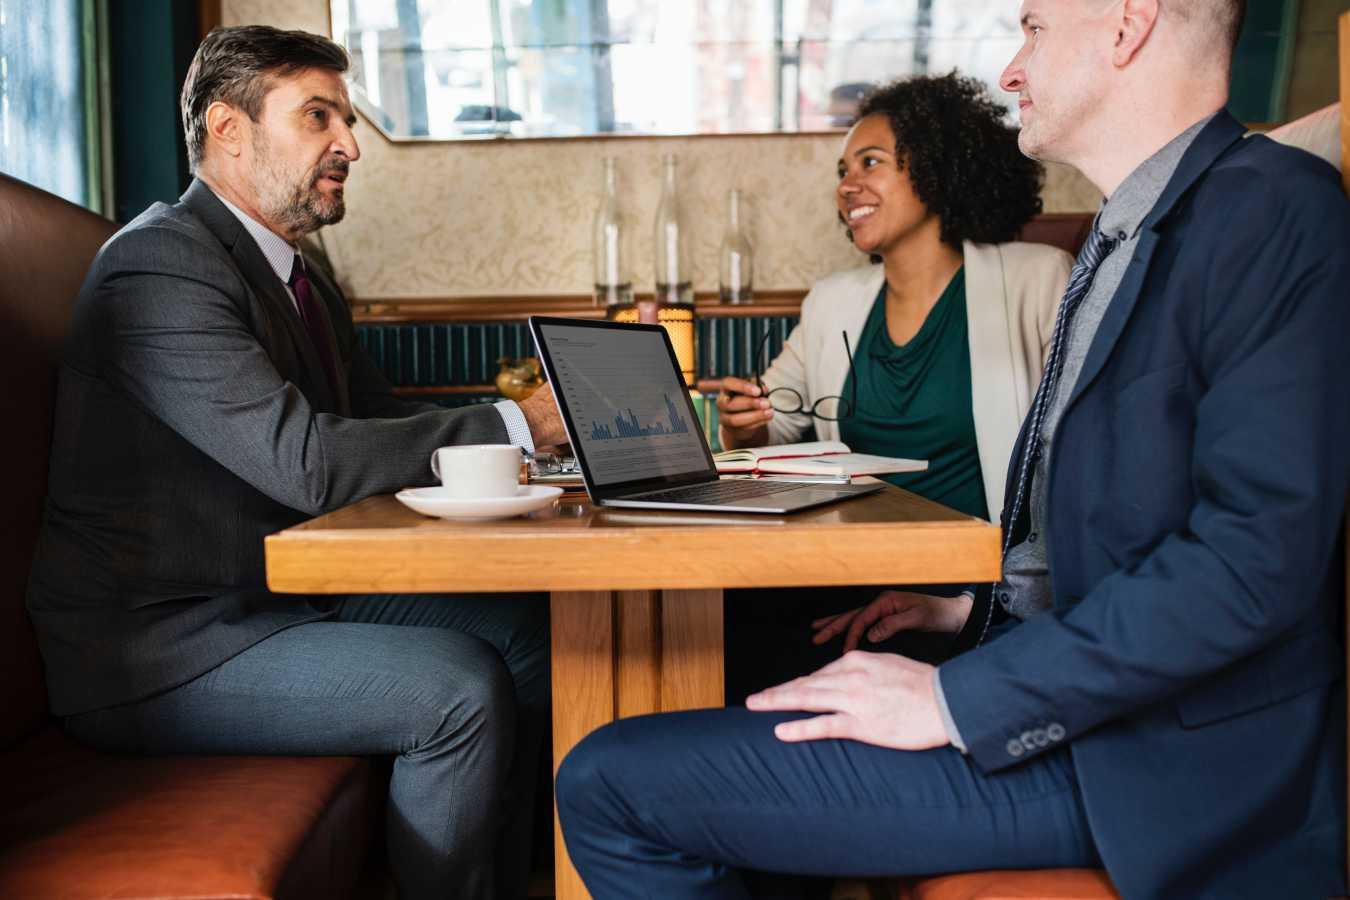 Digital Marketing Strategies for Lawyers